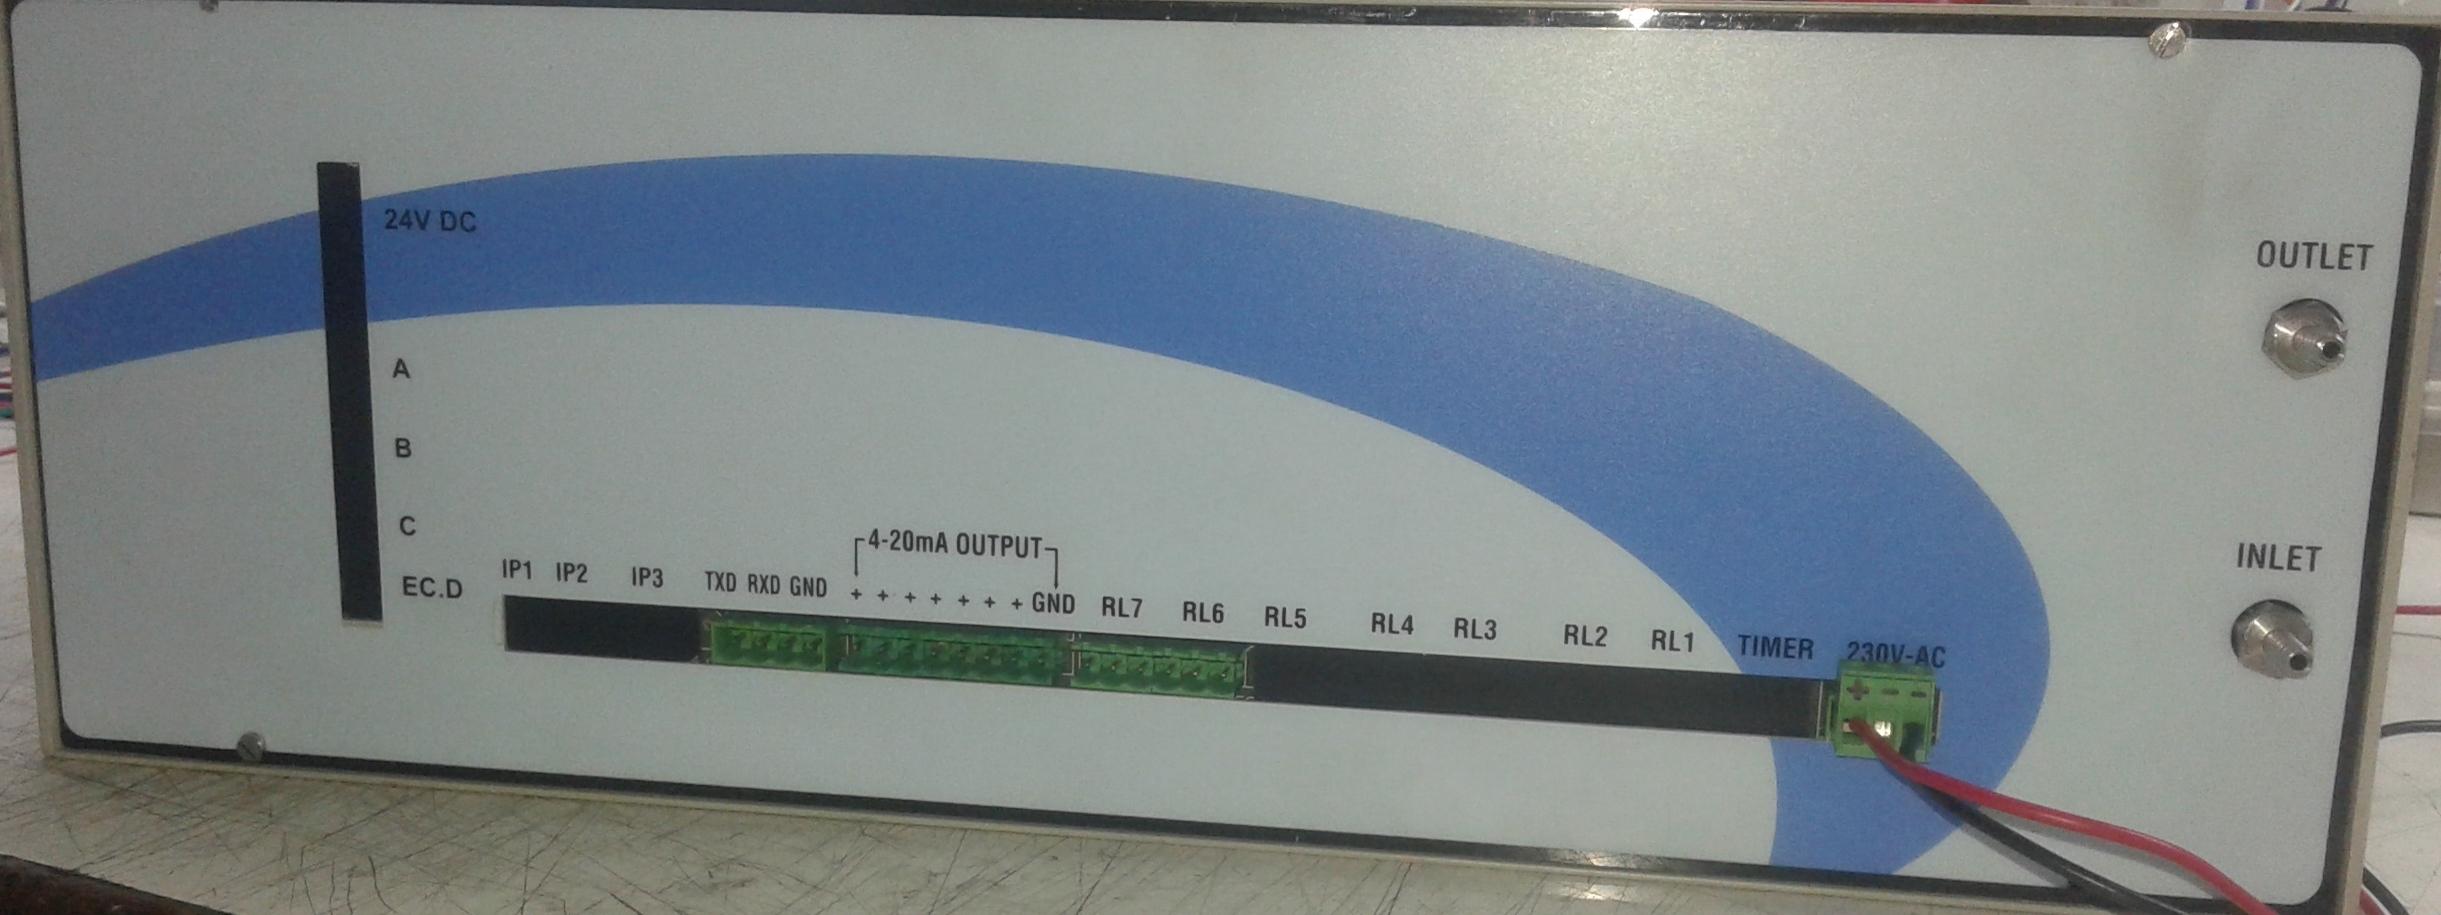 Online Biogas Analyzer